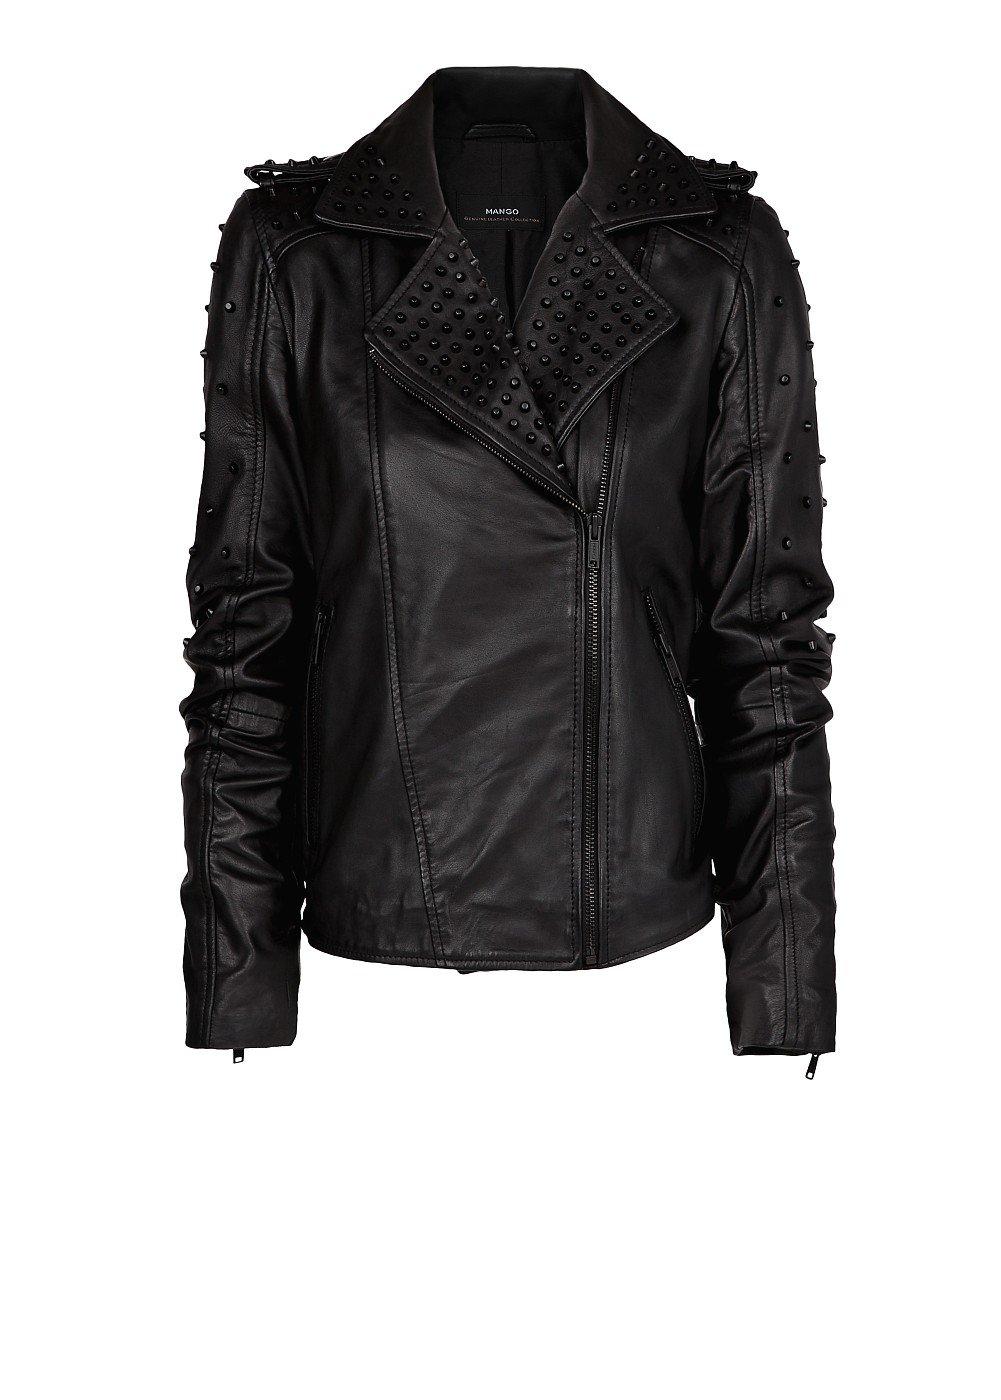 Black leather studded jacket